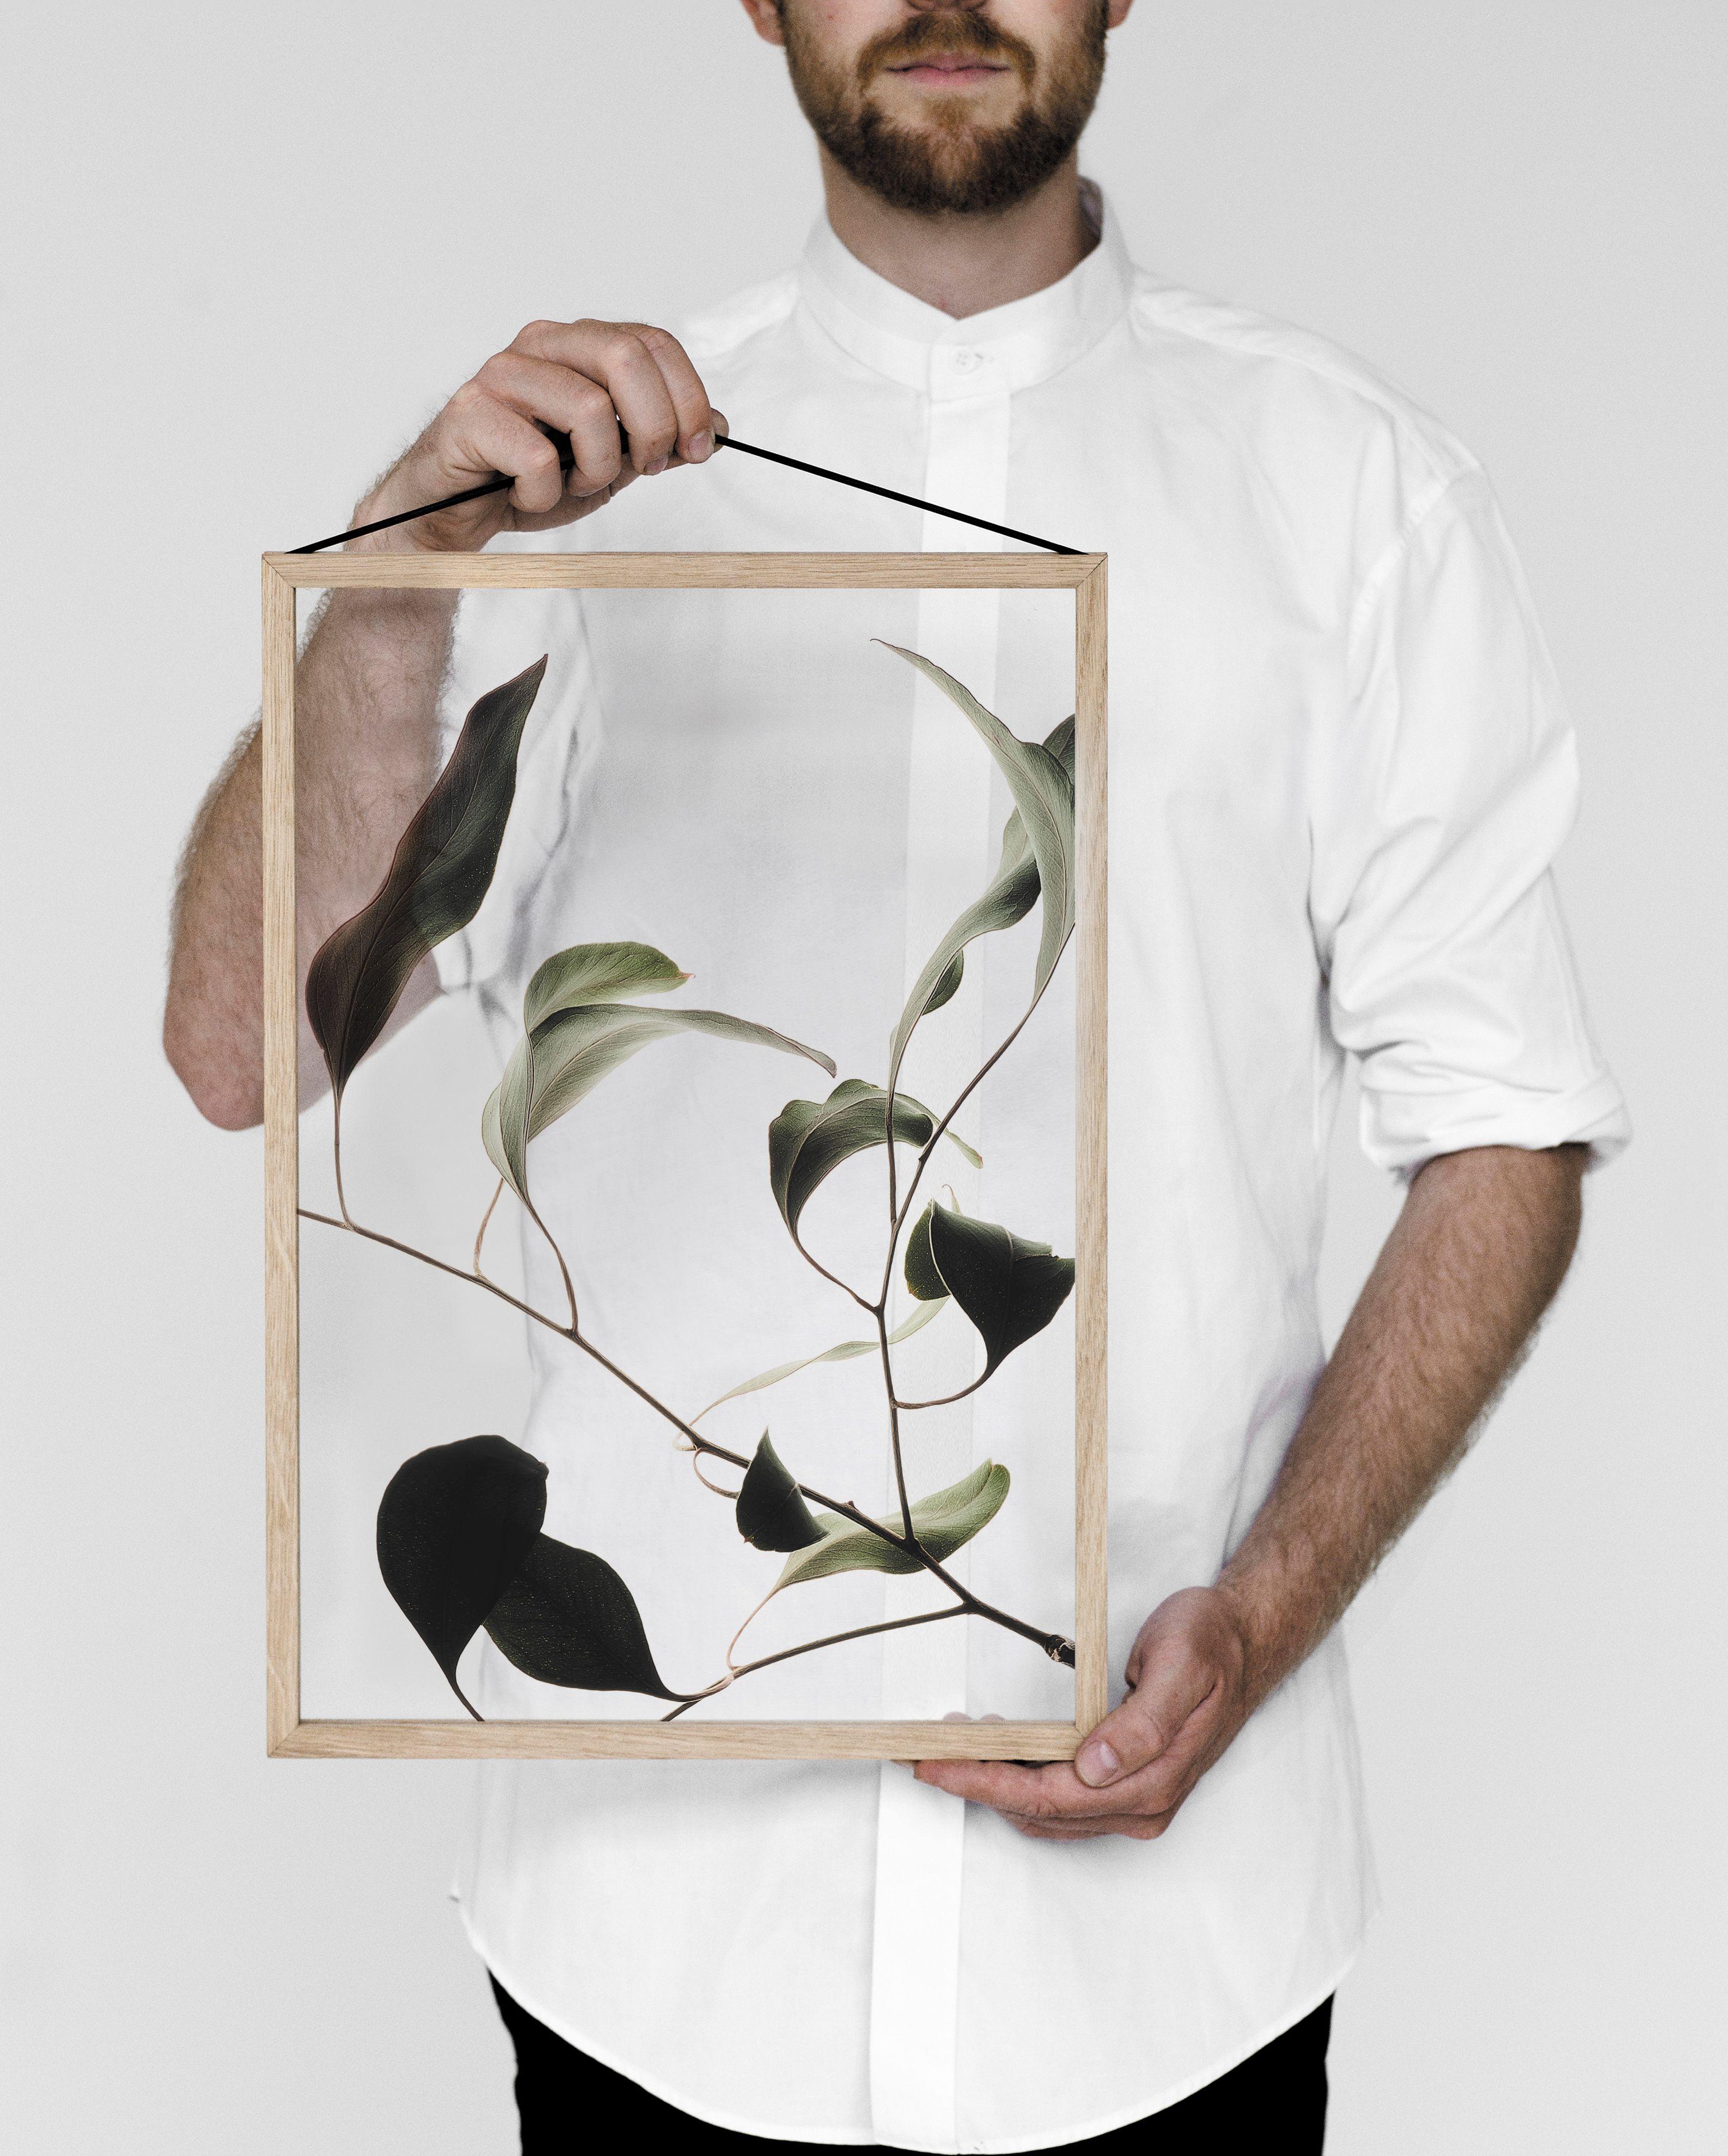 floating leaves 09 // https://paper-collective.com/product/floating-leaves-09/  #art#design#interior #interiordesign#wallart#artprints #artphoto#floatingleaves#leaves#nature #danishdesign#danishart#transparent #transparentprint#scandinaviandesign #decor#homedecor #botanic #green #greenhome #transparentframe #moebe #plant #greenliving